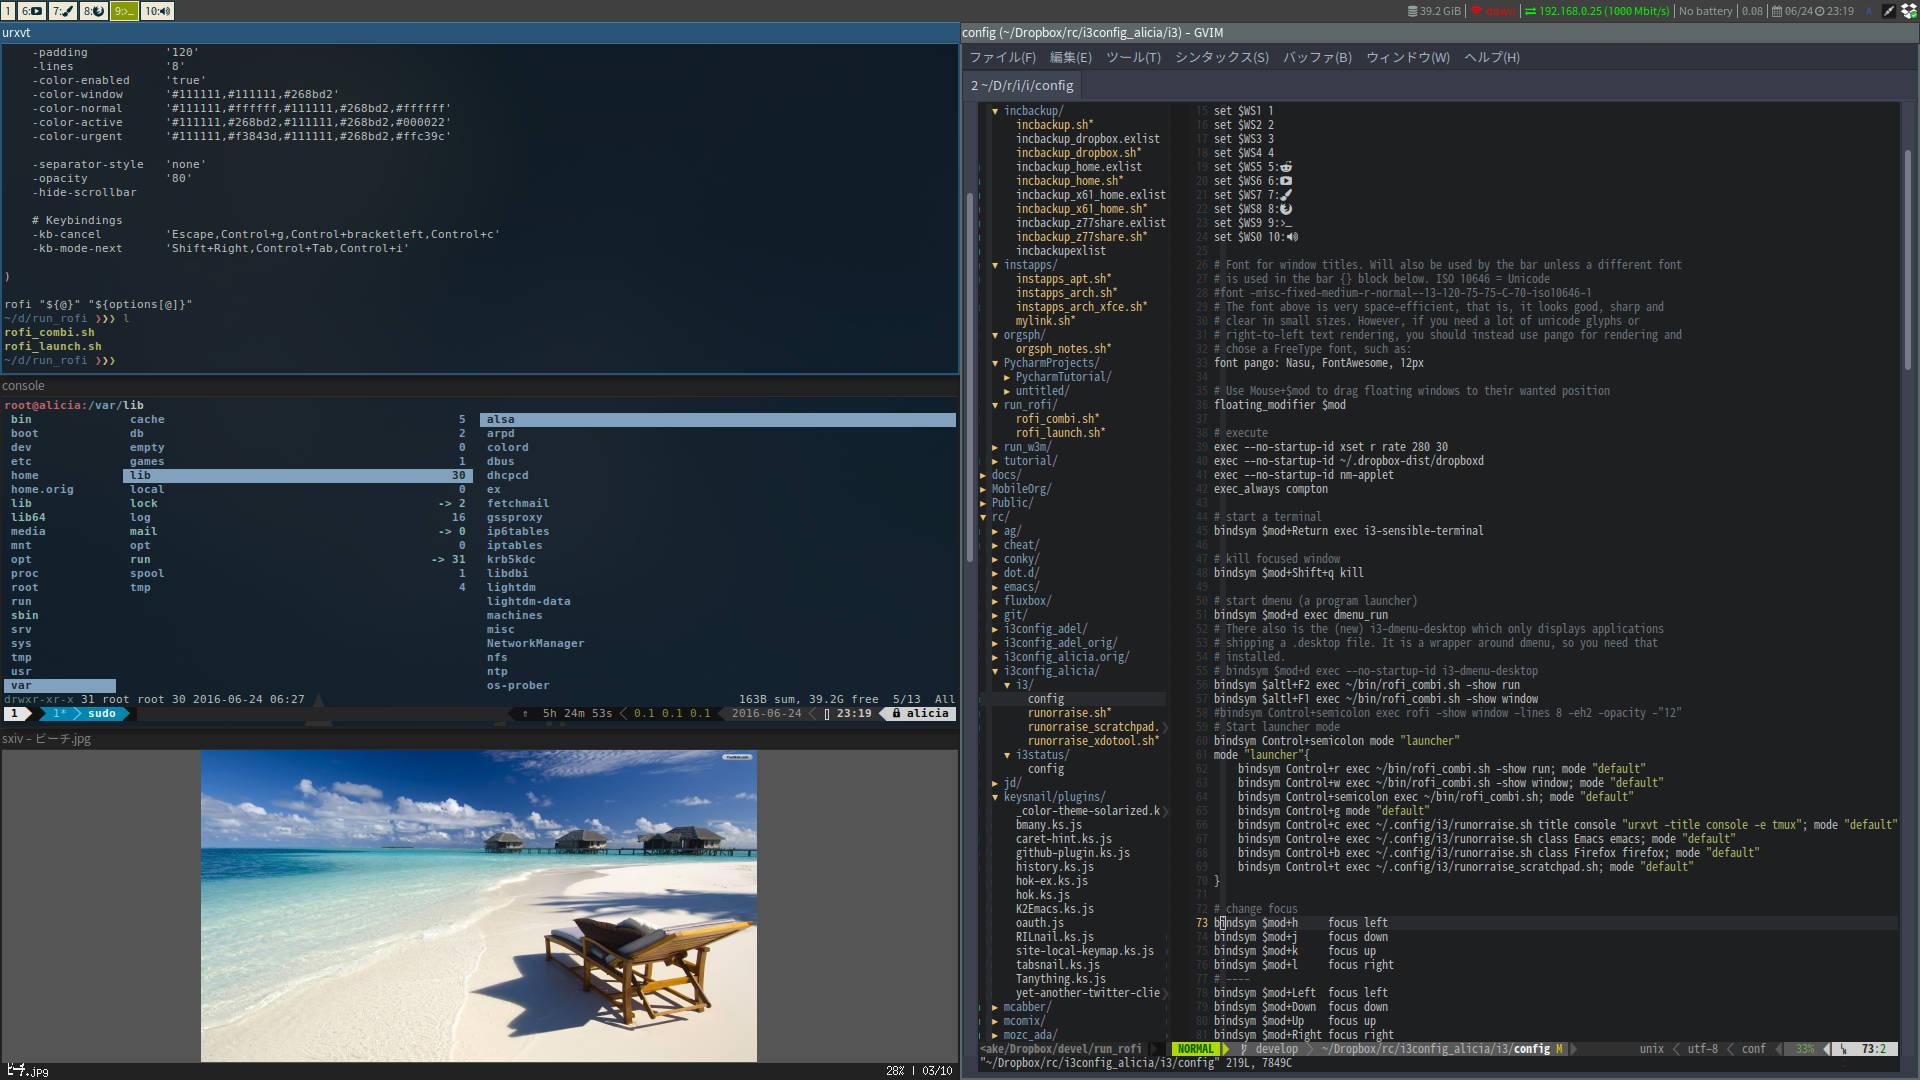 i3_wm_demo_tiling.jpg